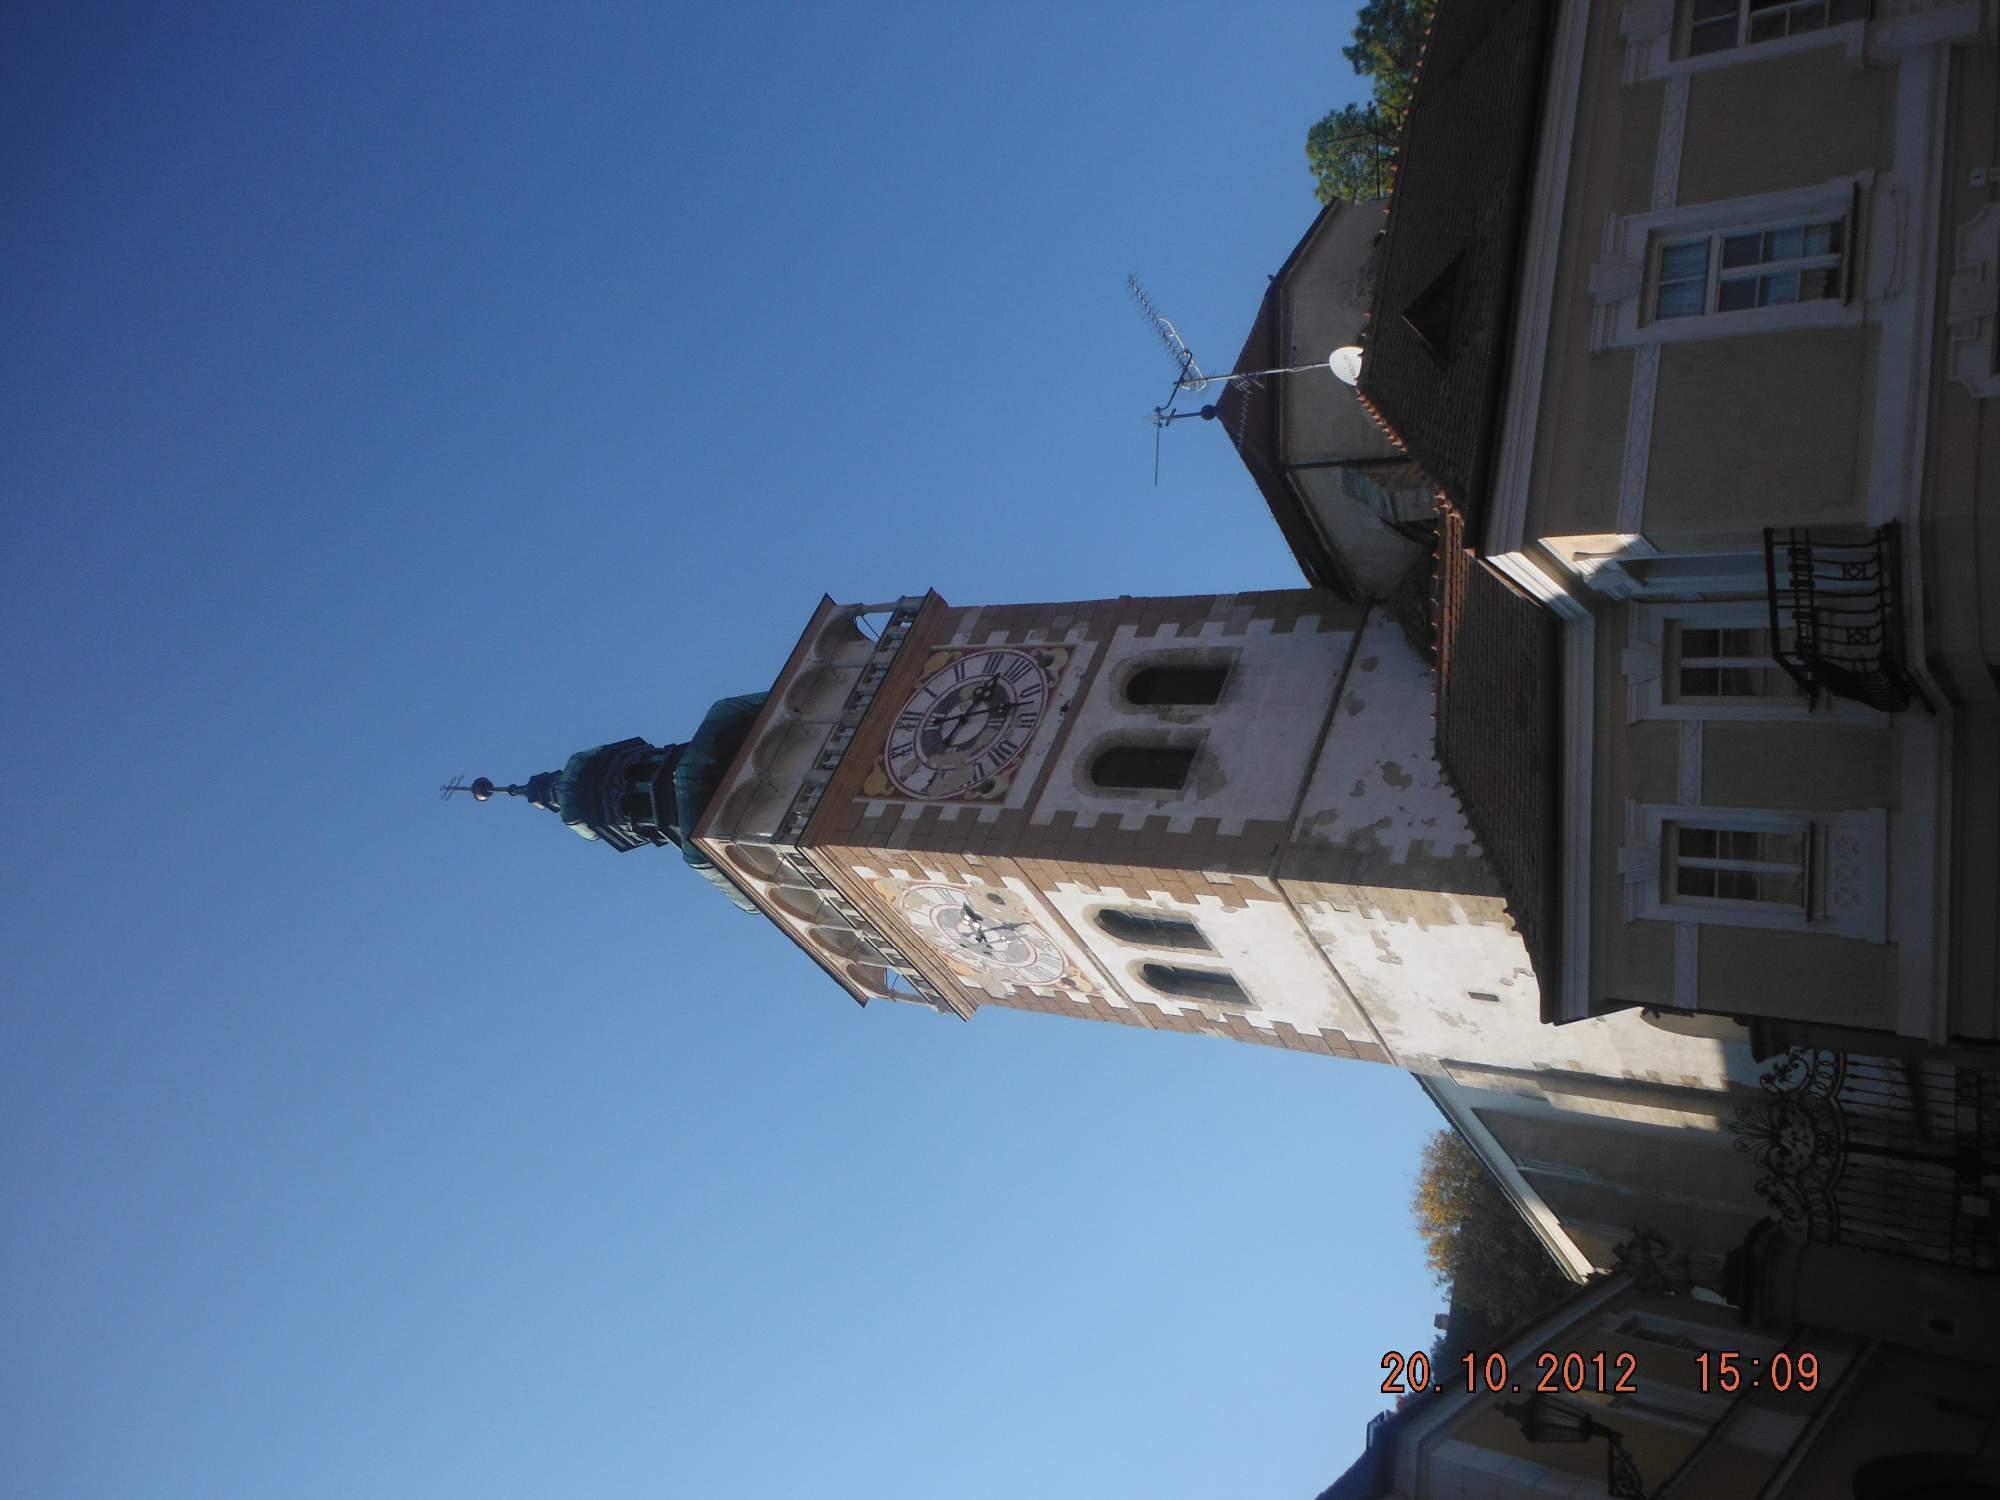 http://img24.rajce.idnes.cz/d2403/13/13214/13214242_a1e43f49e51a1daa7632f800d4edae3f/images/SAE634.jpg